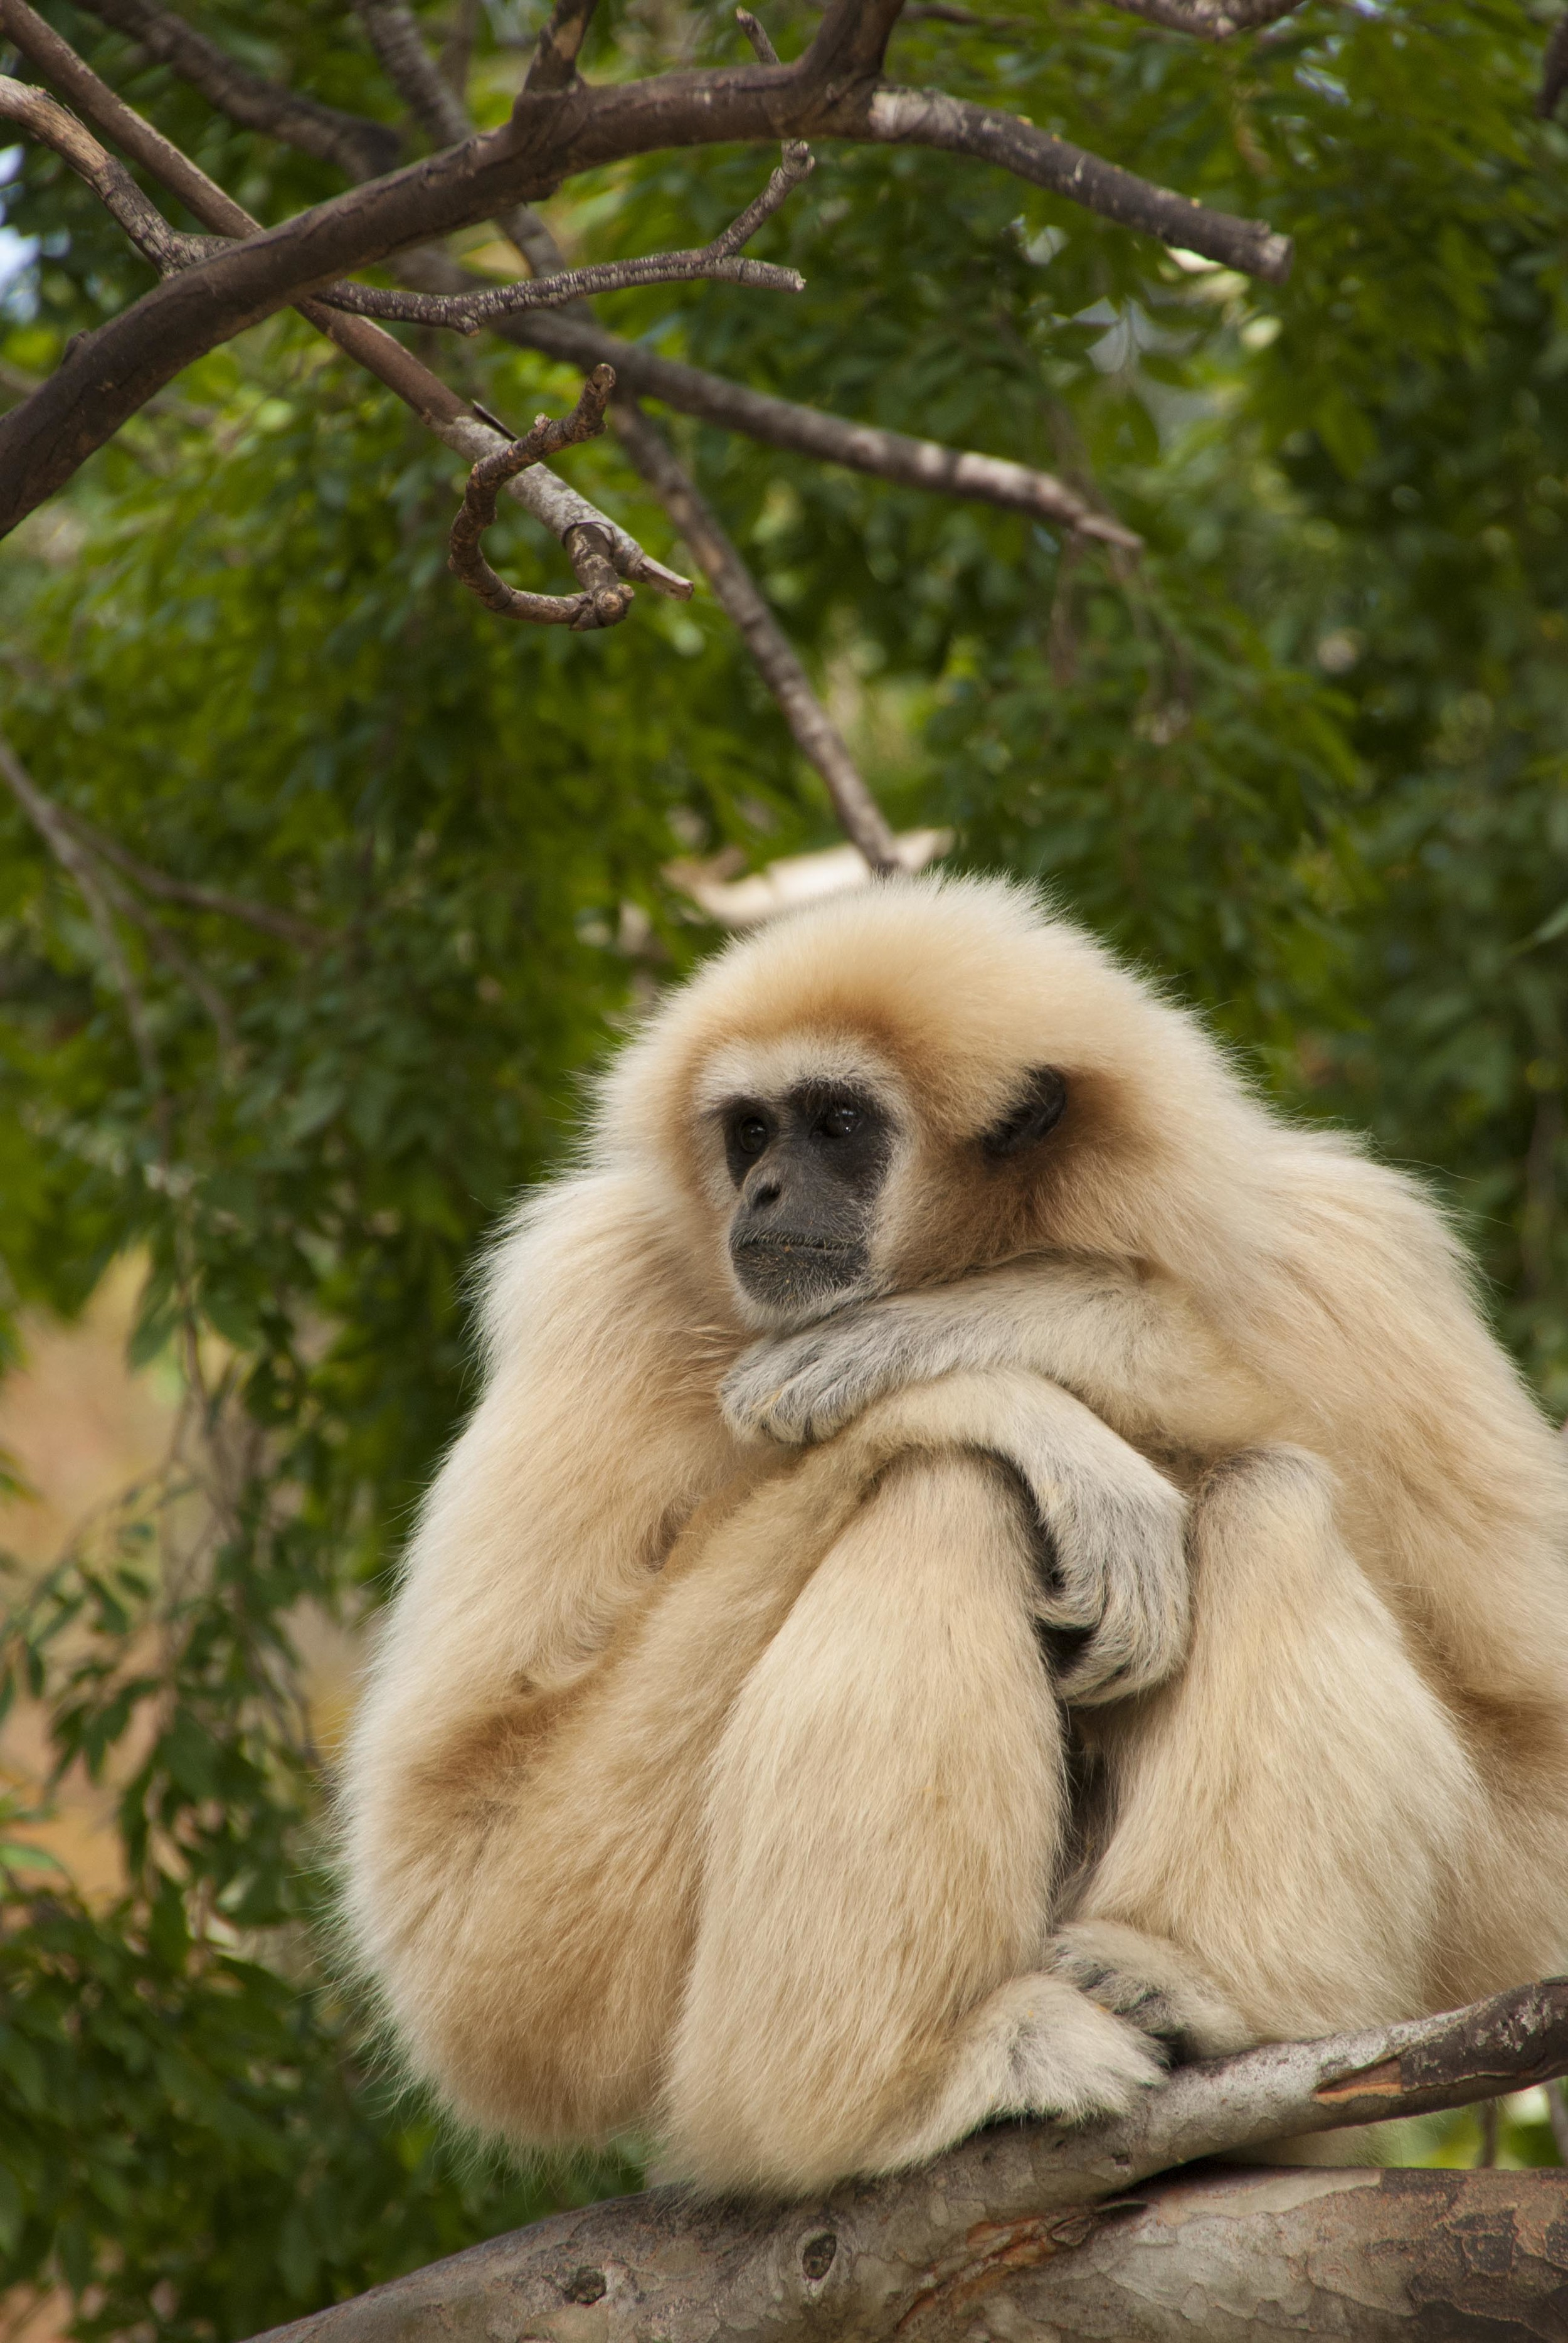 gibbon looking sad.jpg